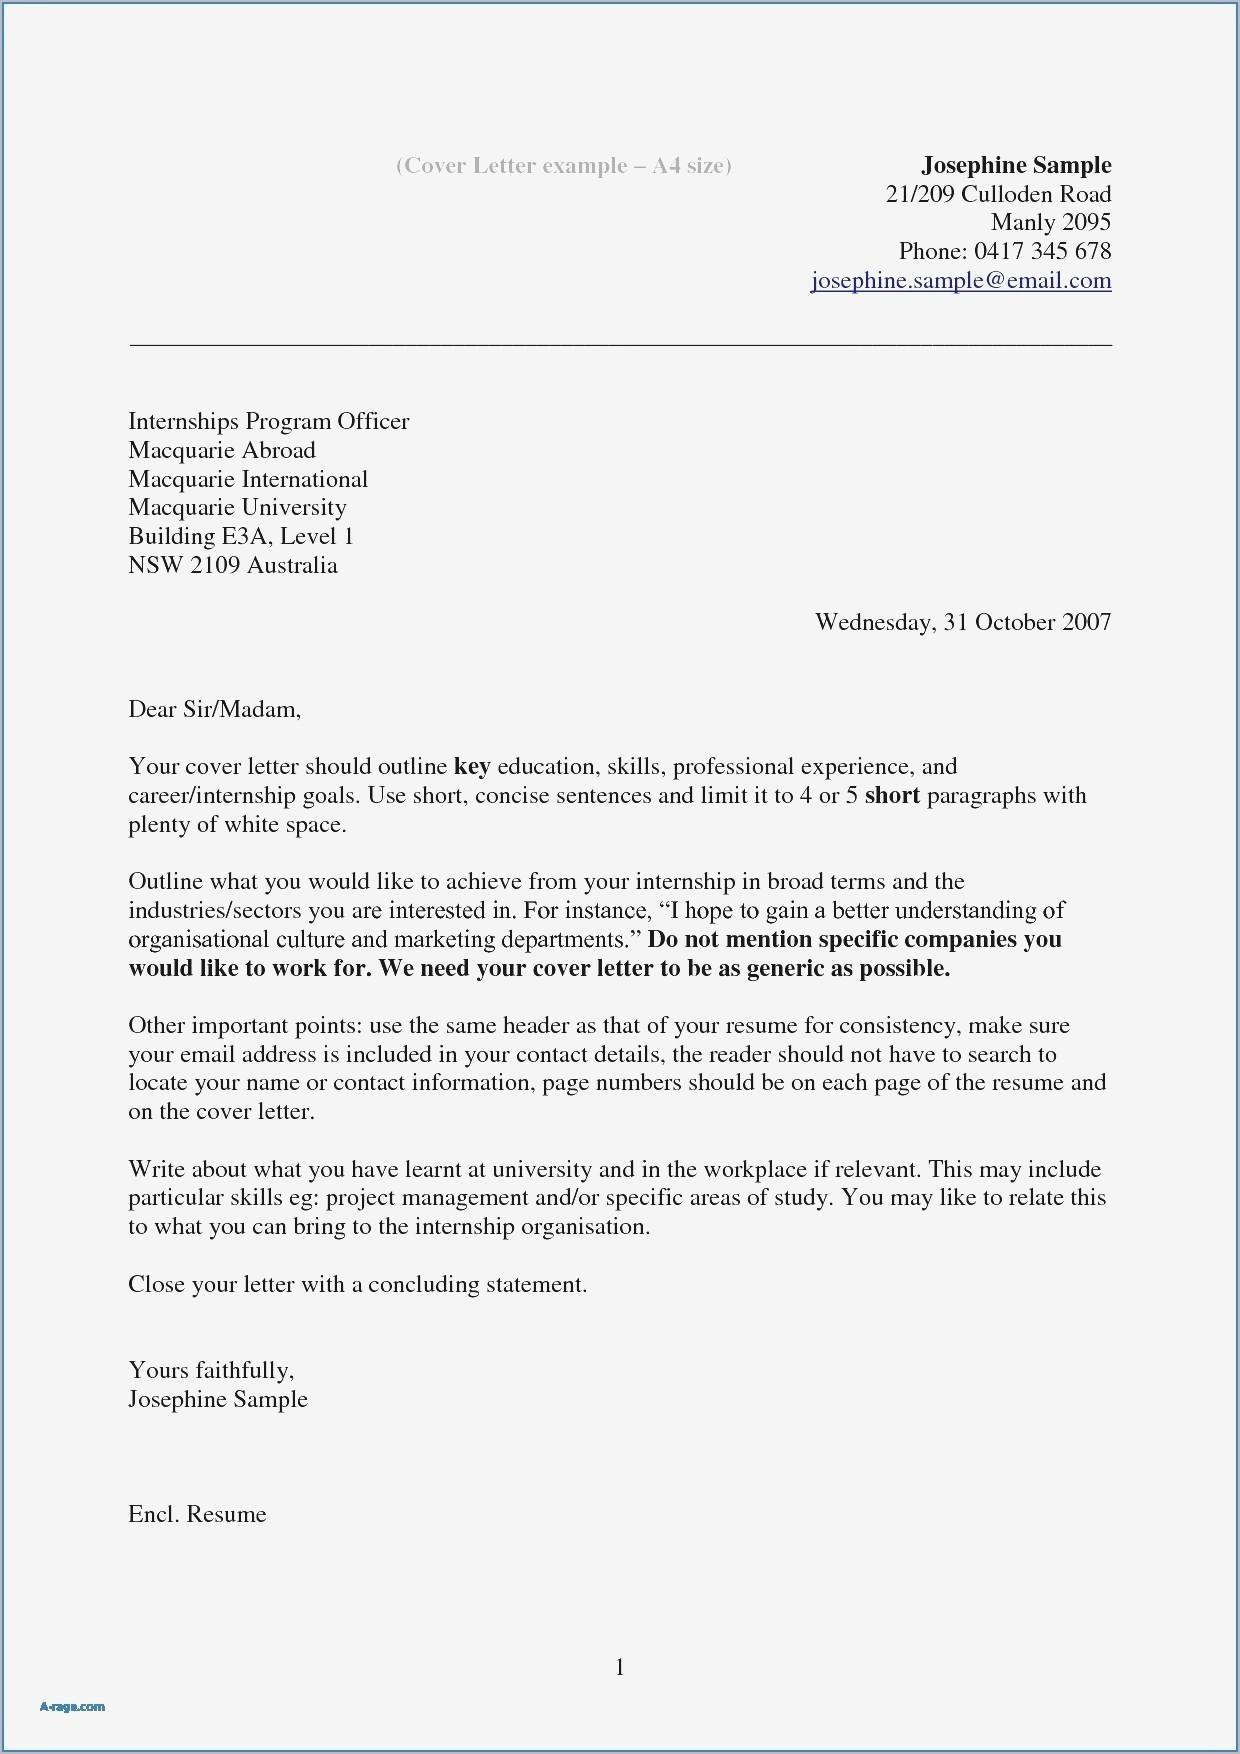 Cv Letter Template - Free Resume Cover Letter Beautiful Best Pr Resume Template Elegant